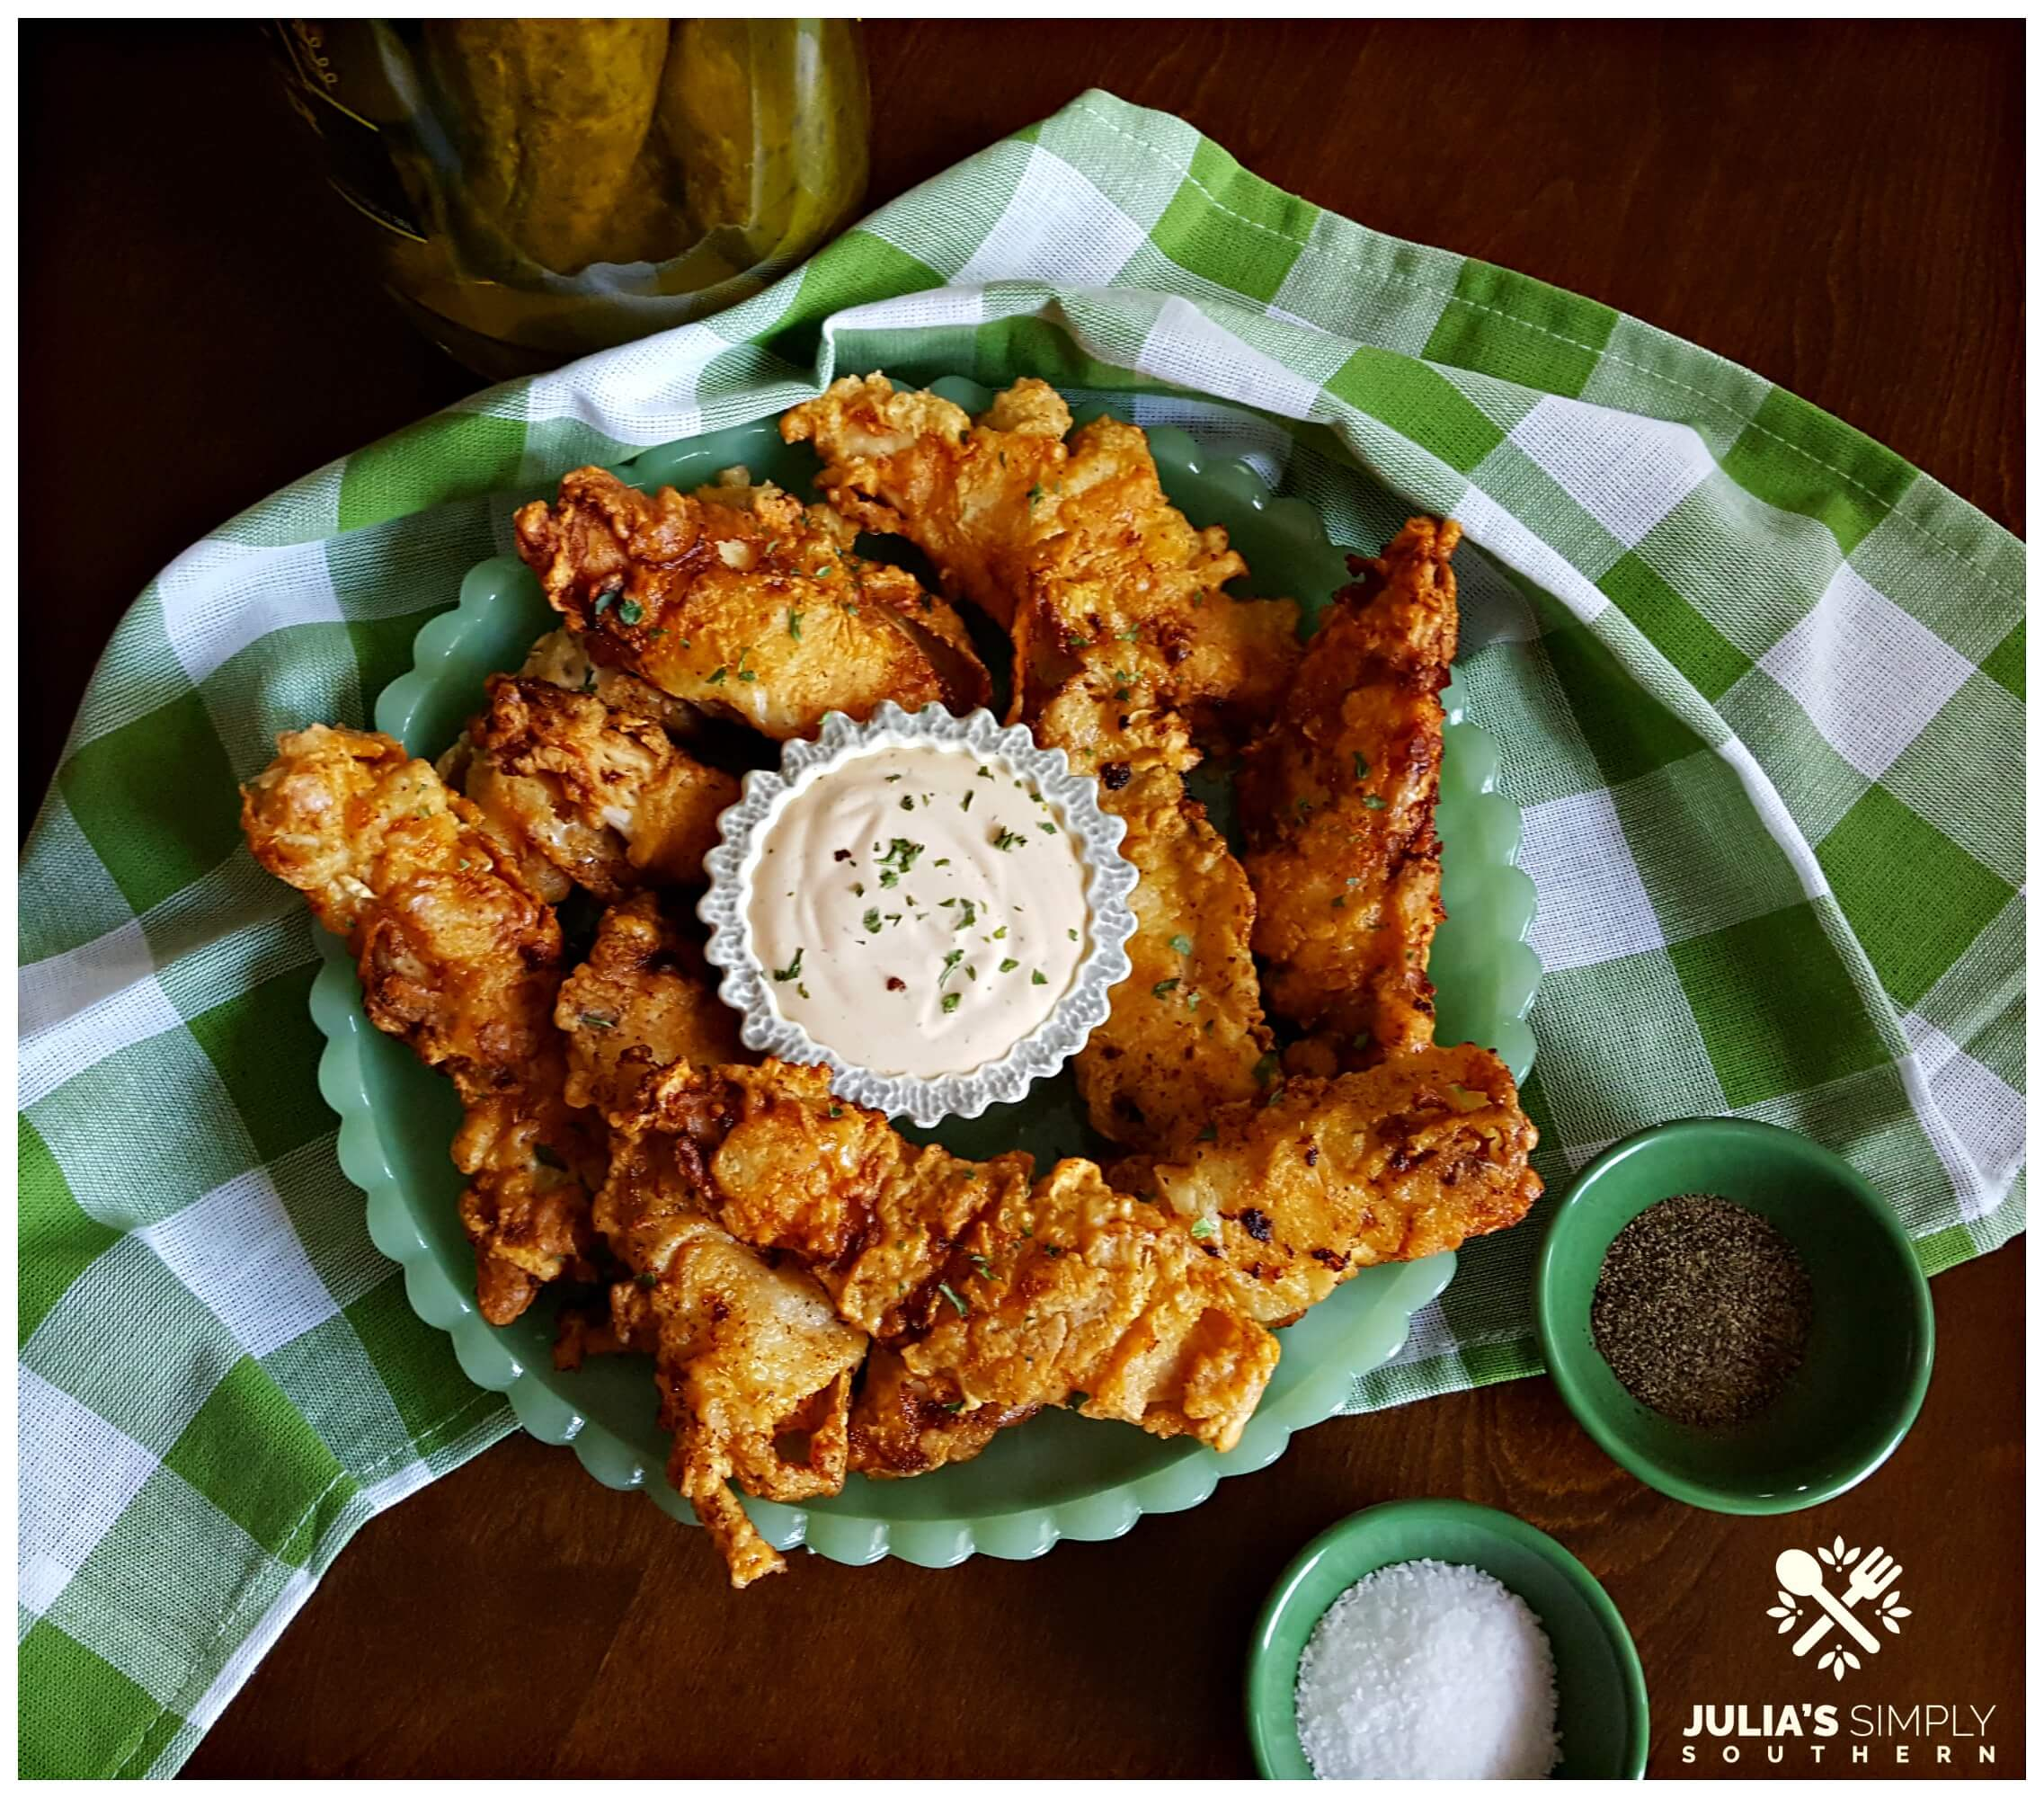 Dill Pickle Fried Chicken on a green jadeite glassware platter